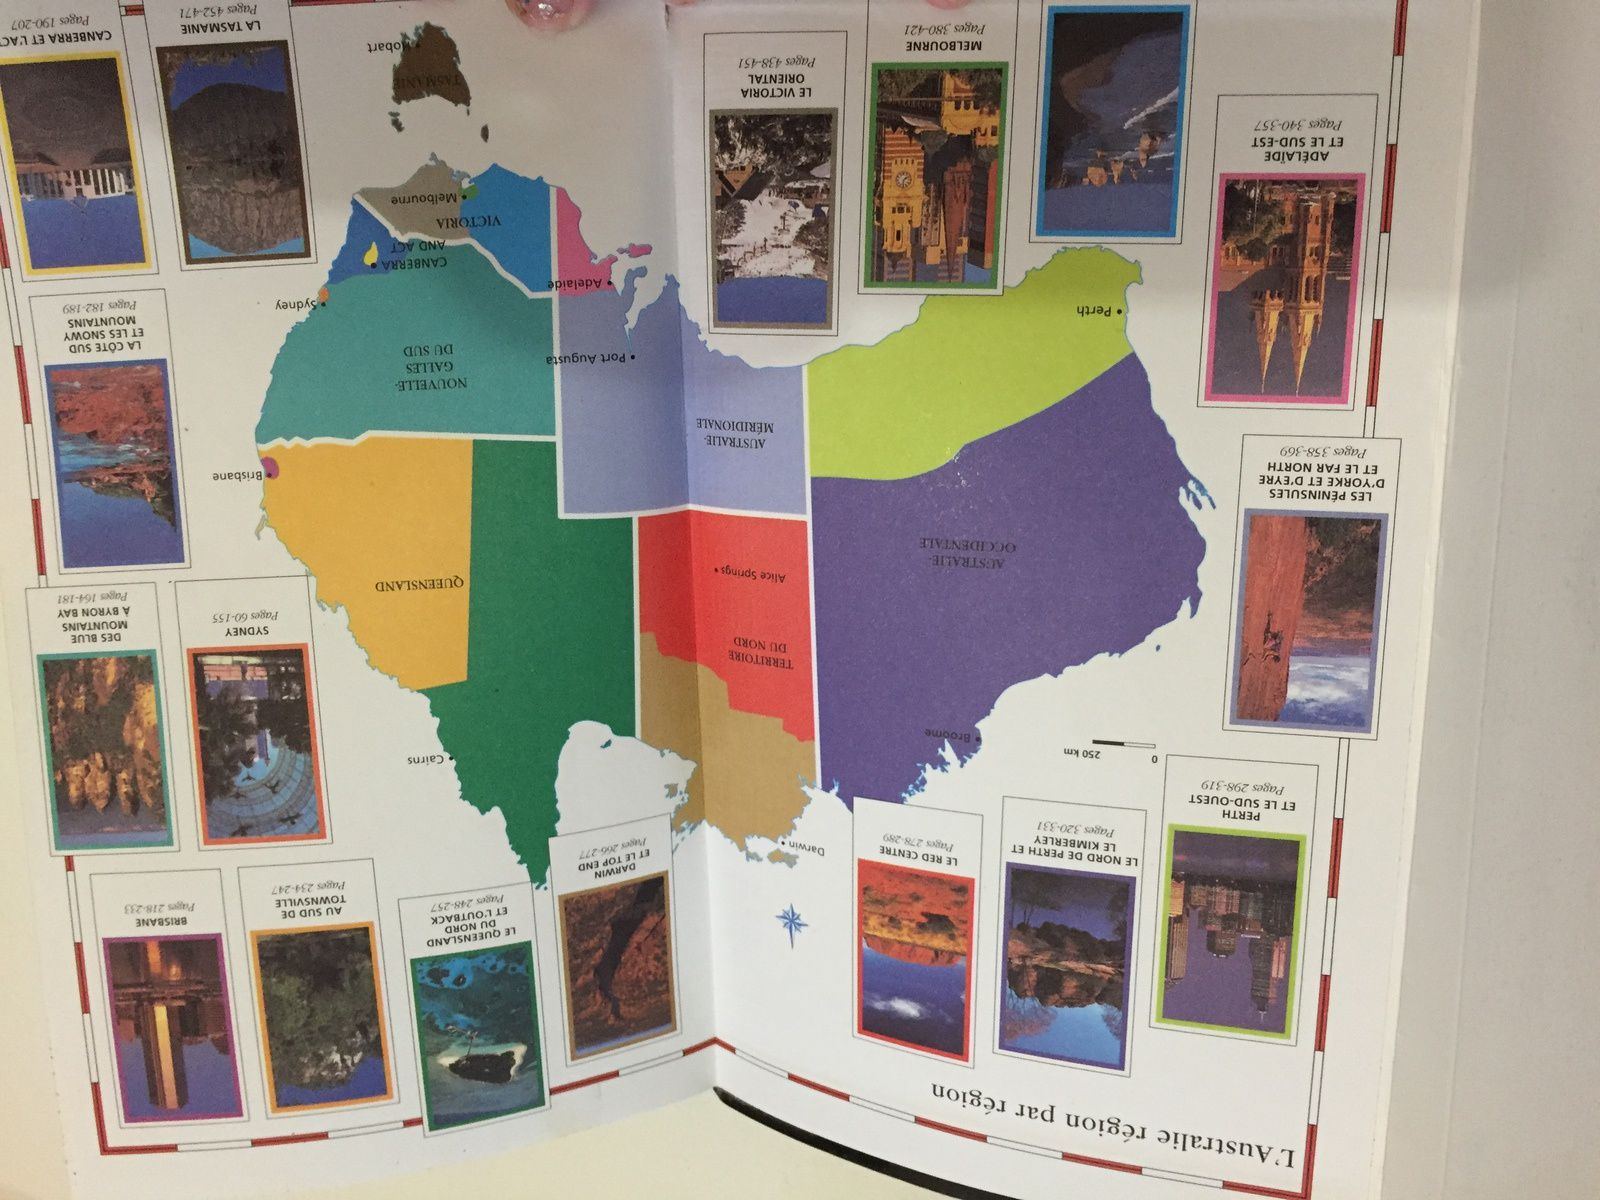 #australie #guide #hachette #voir #charlotteblabla blog